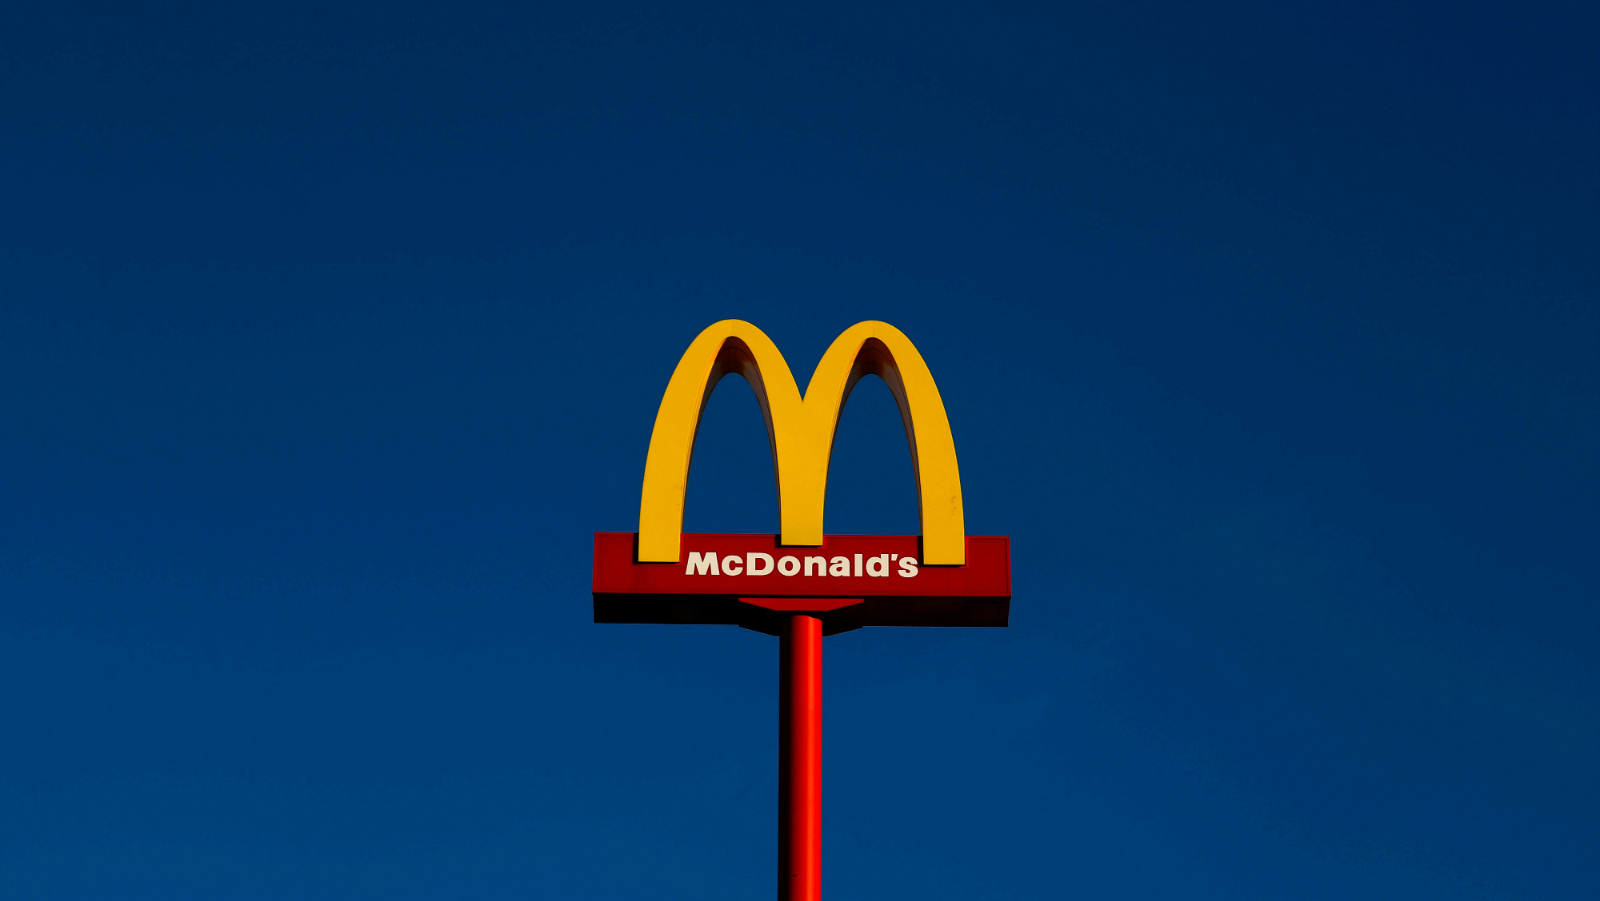 mcdonalds make winning decisions - HD1600×901